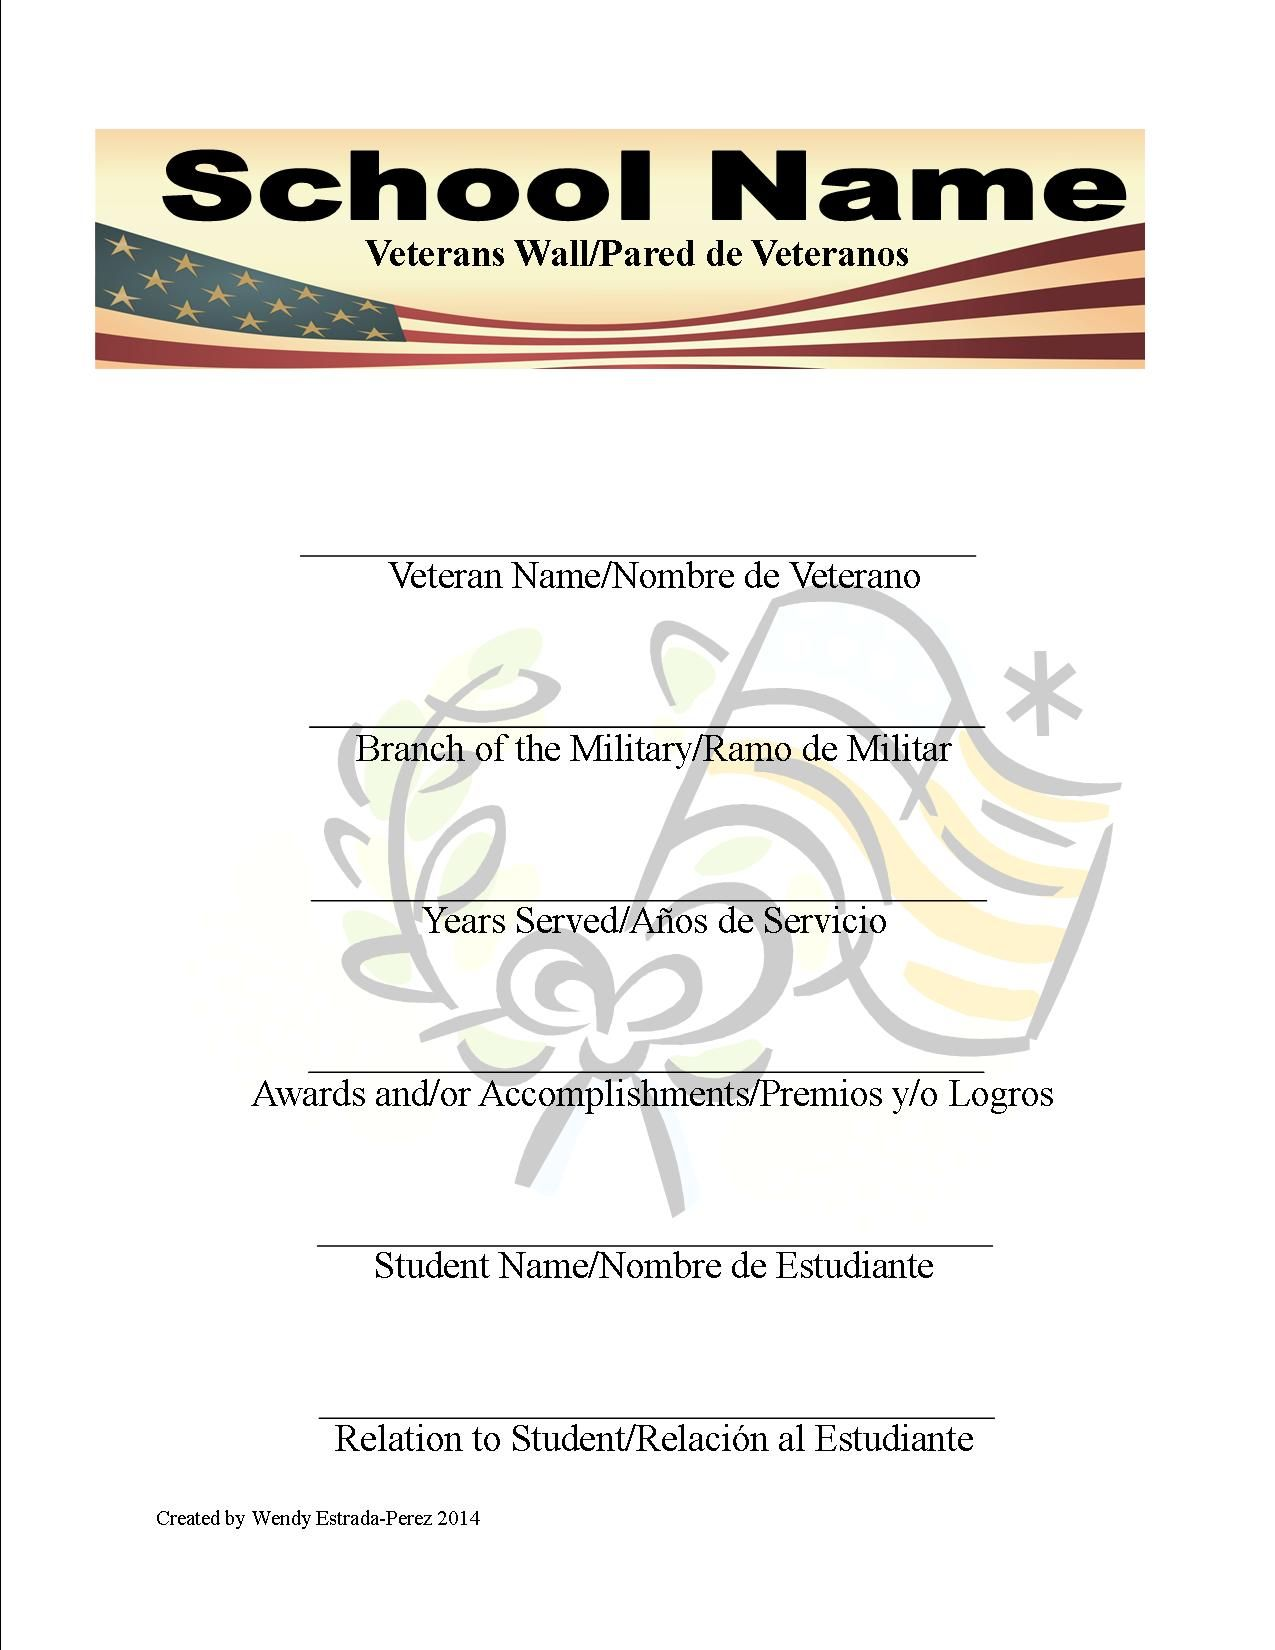 Veteran Day Flyer For A School